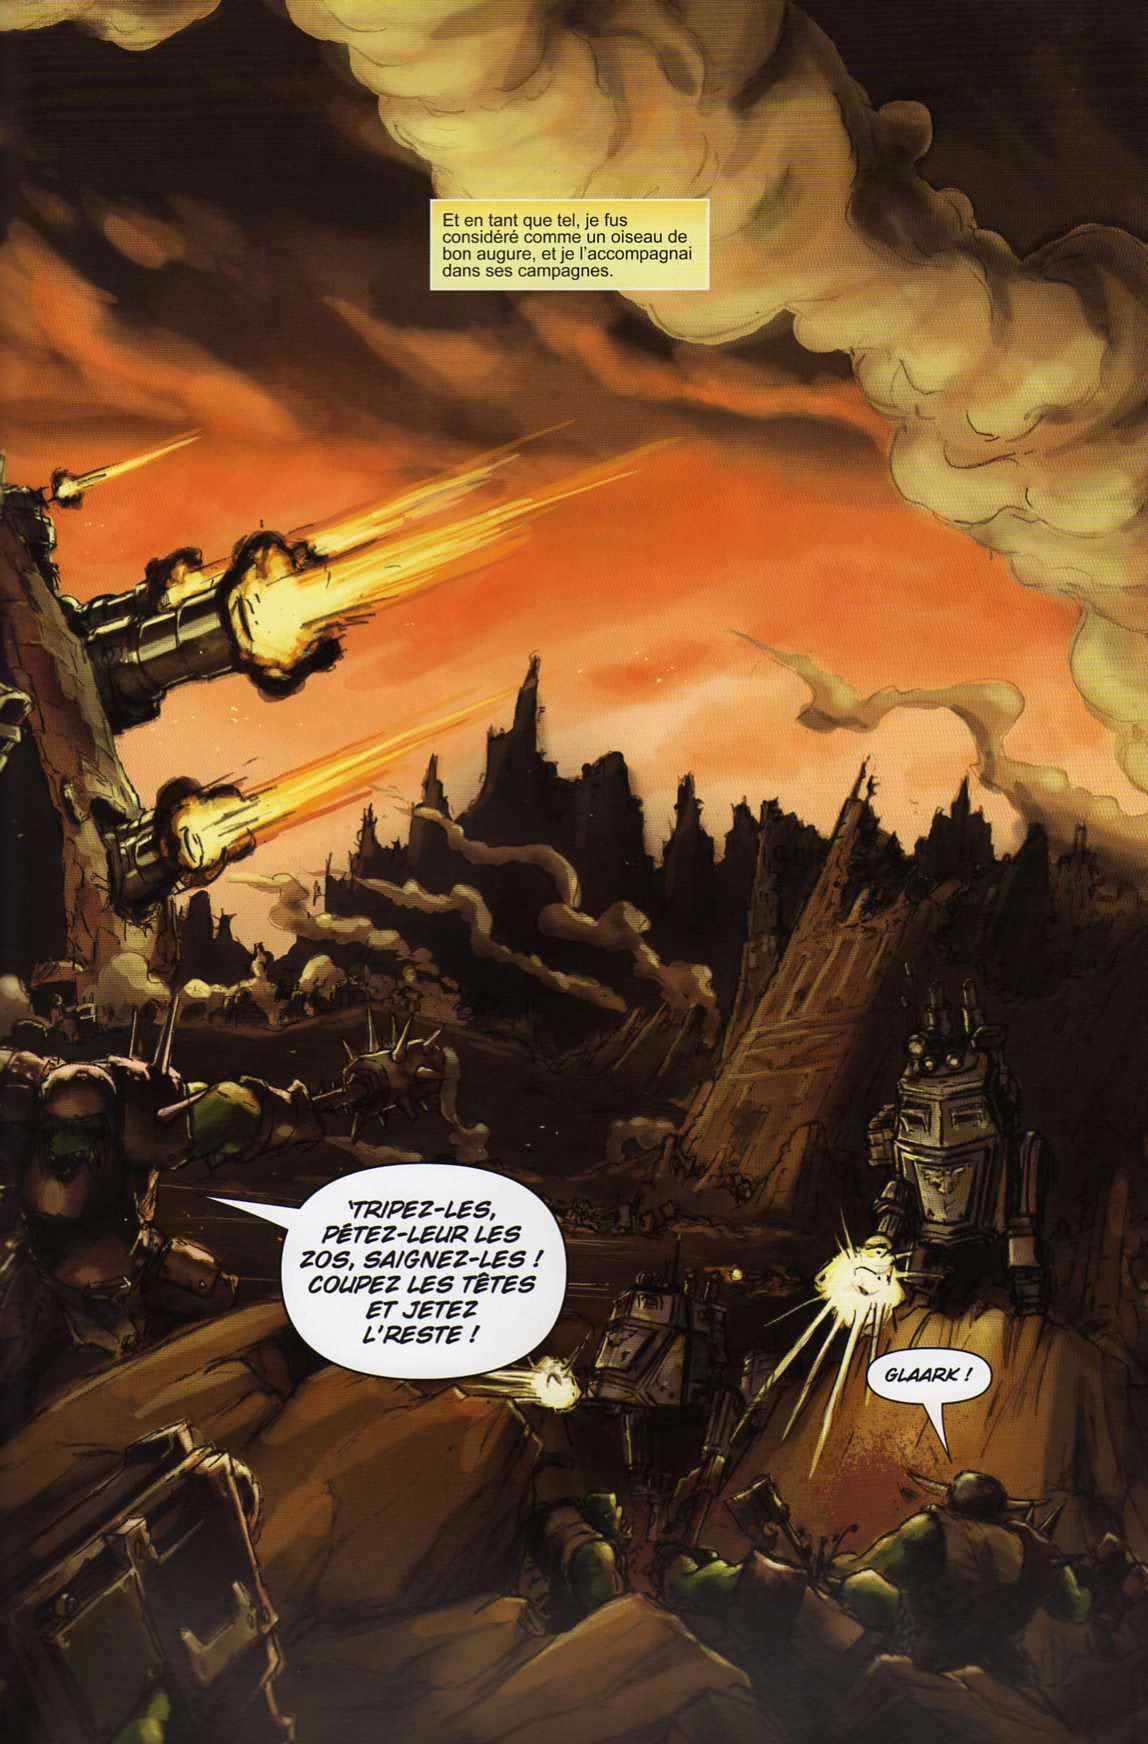 T4 : Le clan des Orks - Warhammer 40.000 (page 3)